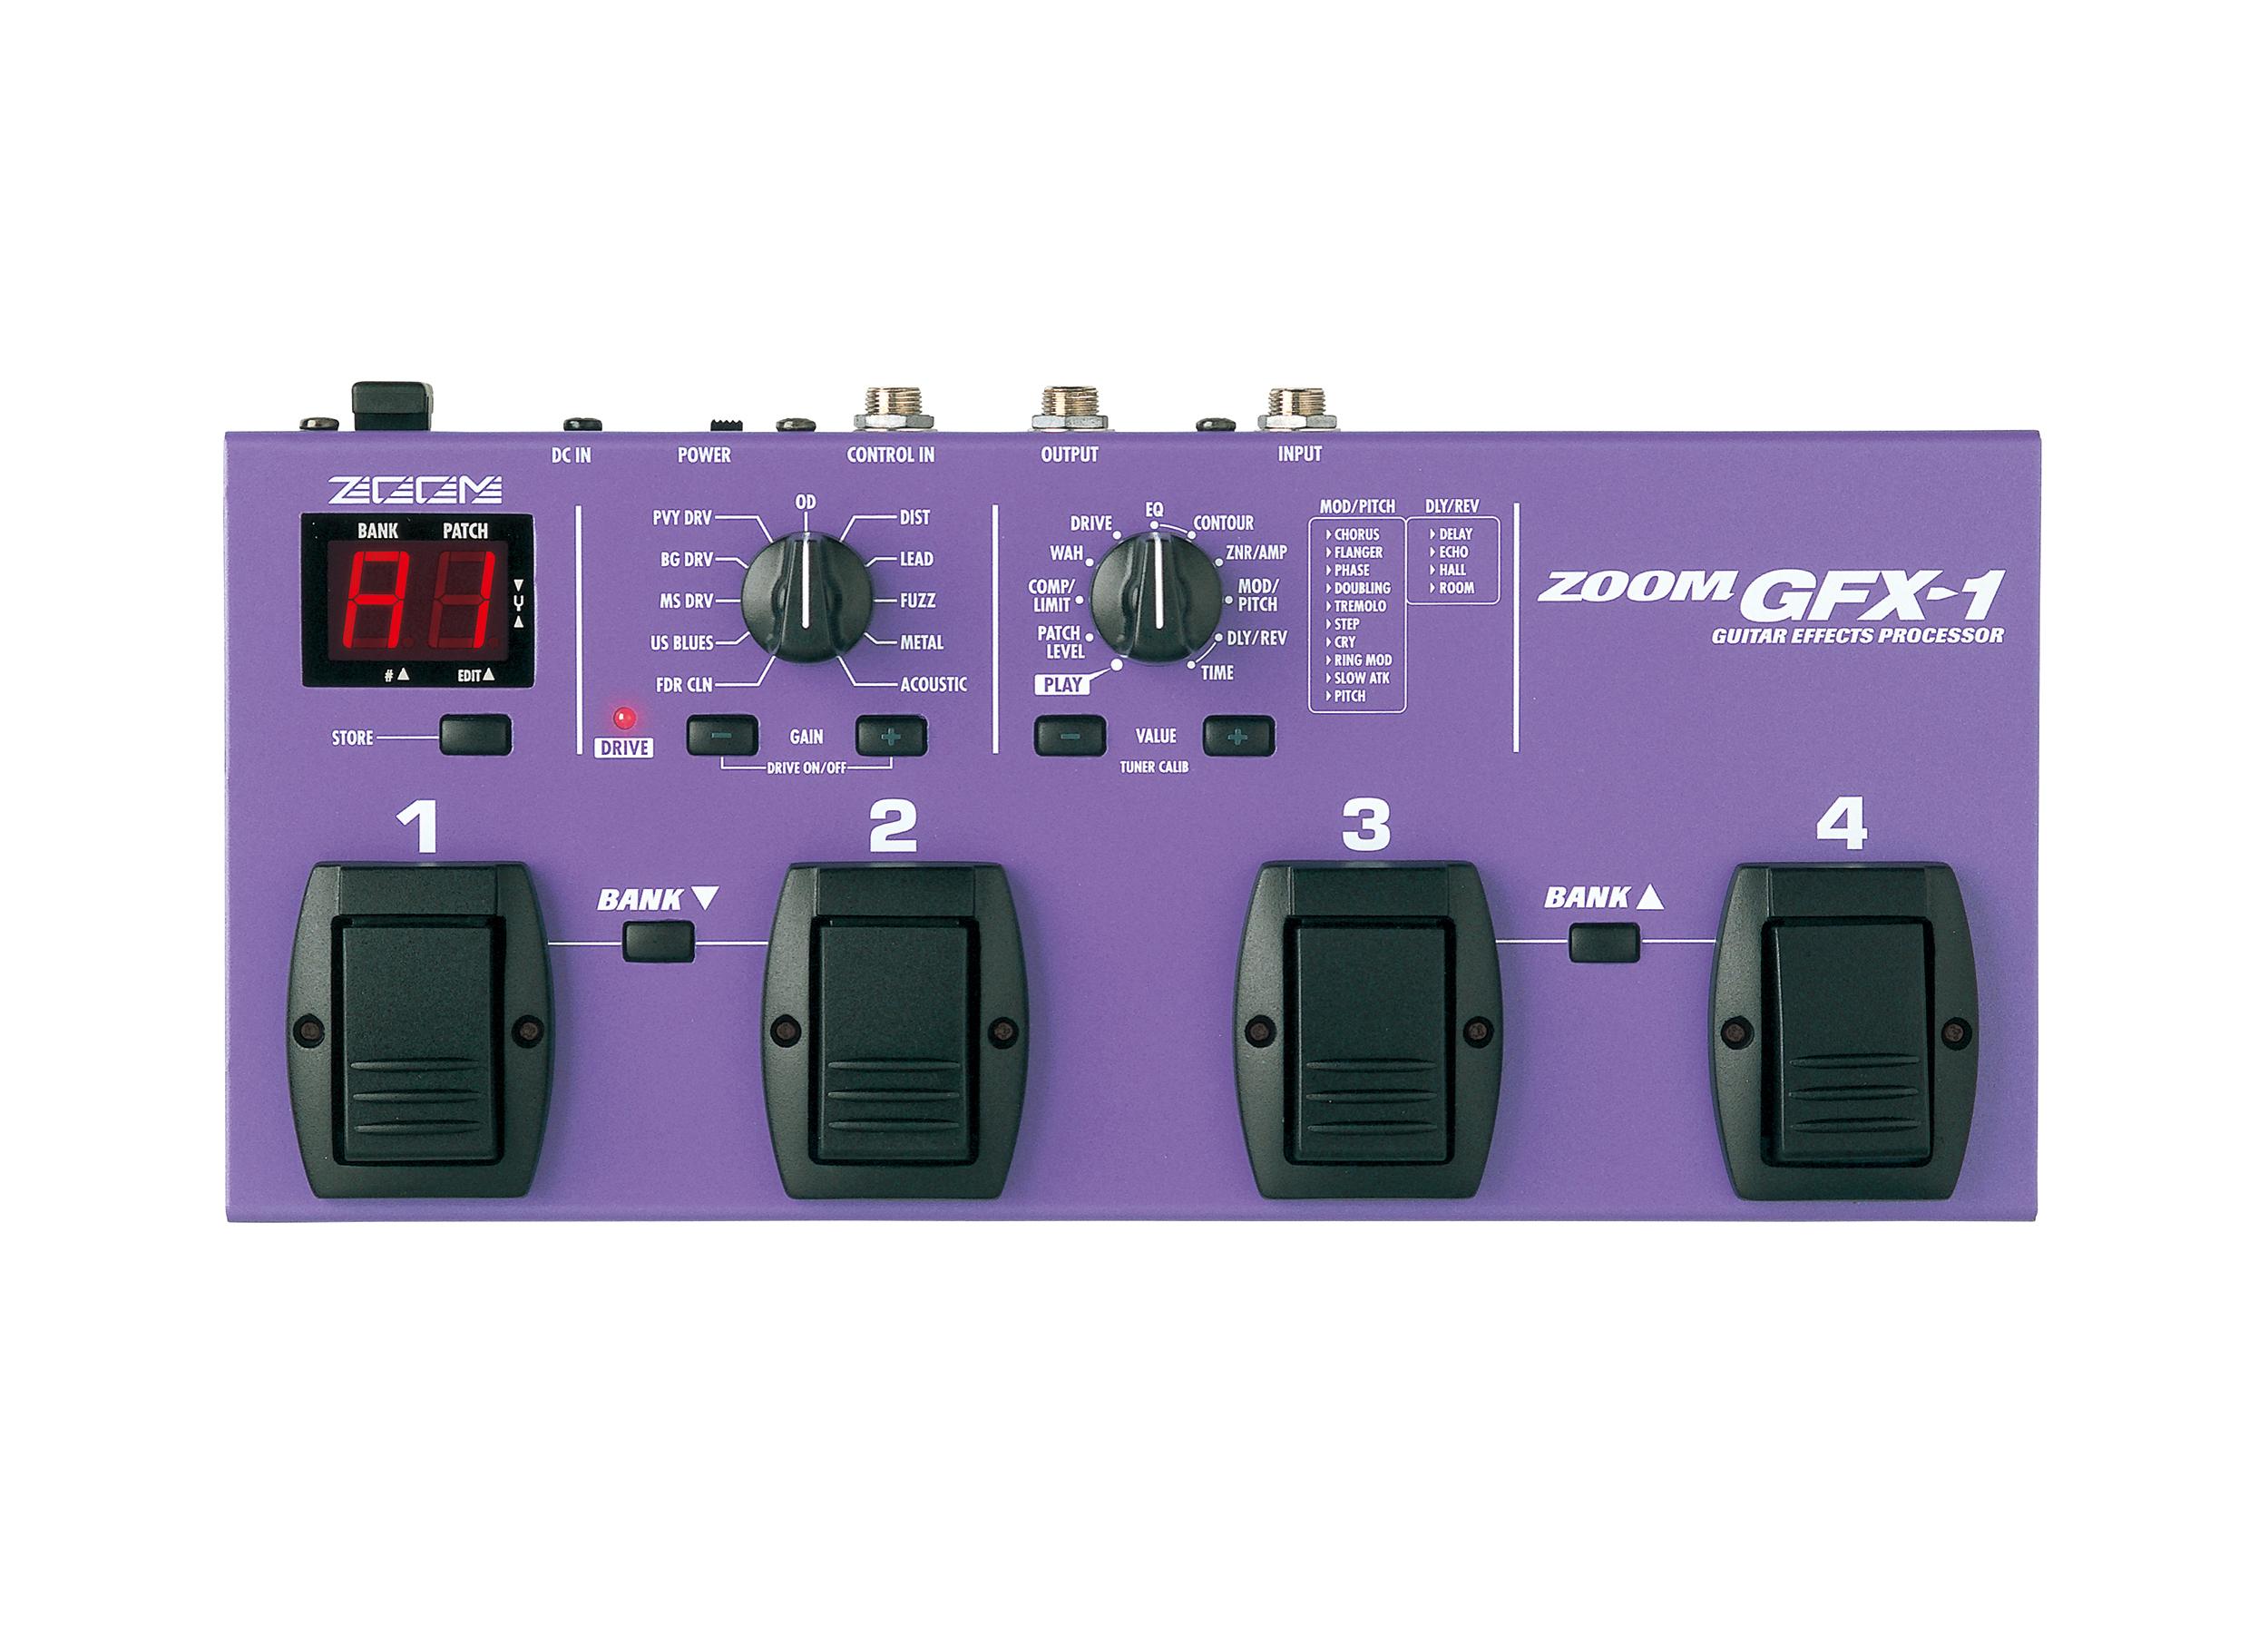 gfx 1 guitar effects processor zoom. Black Bedroom Furniture Sets. Home Design Ideas